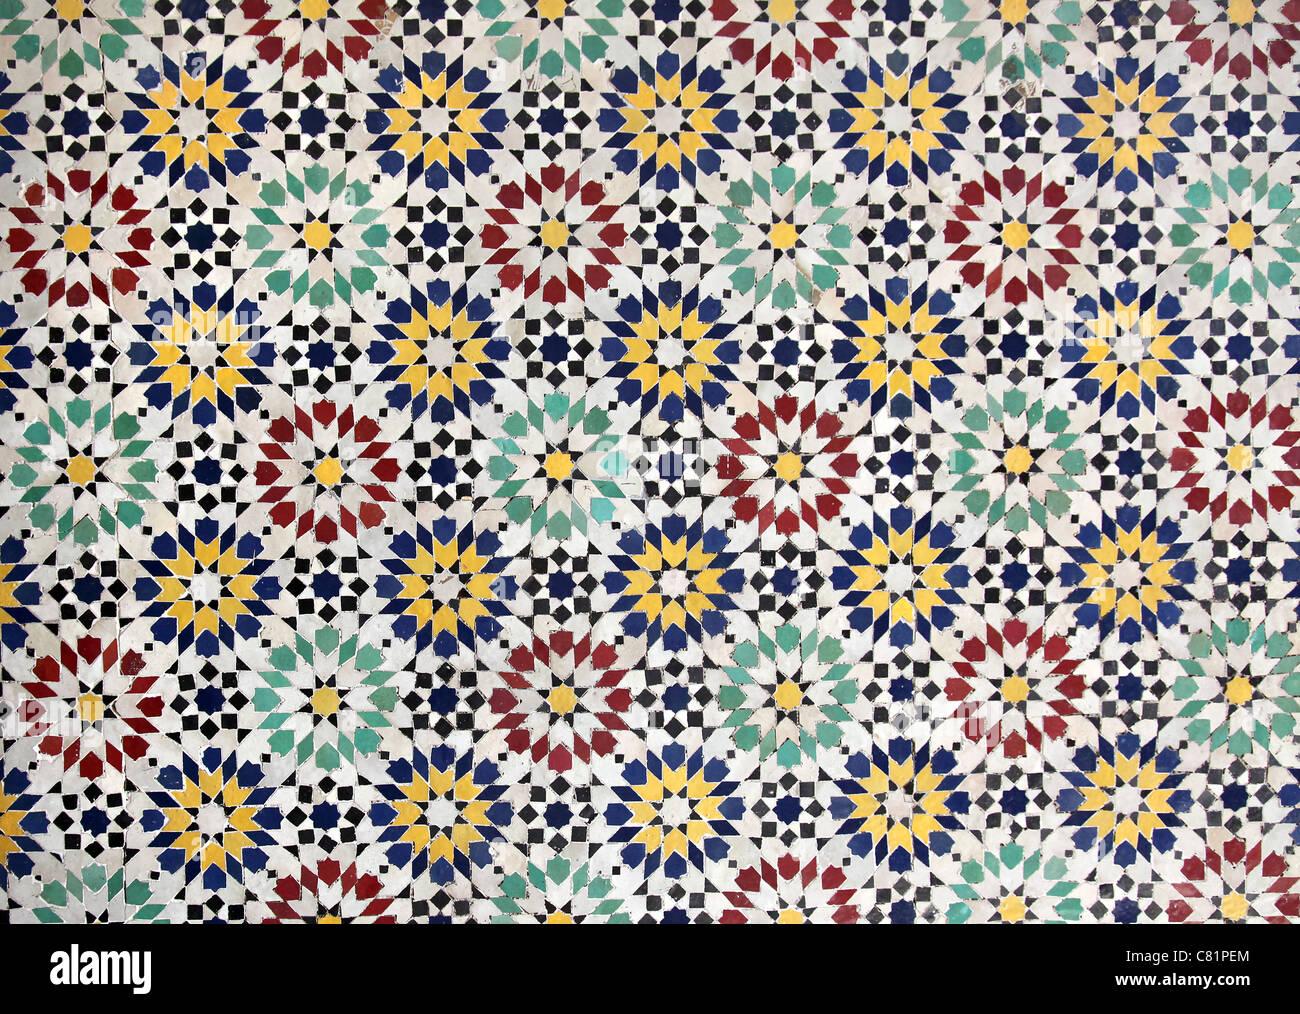 Moroccan Ceramic Tiles - Stock Image